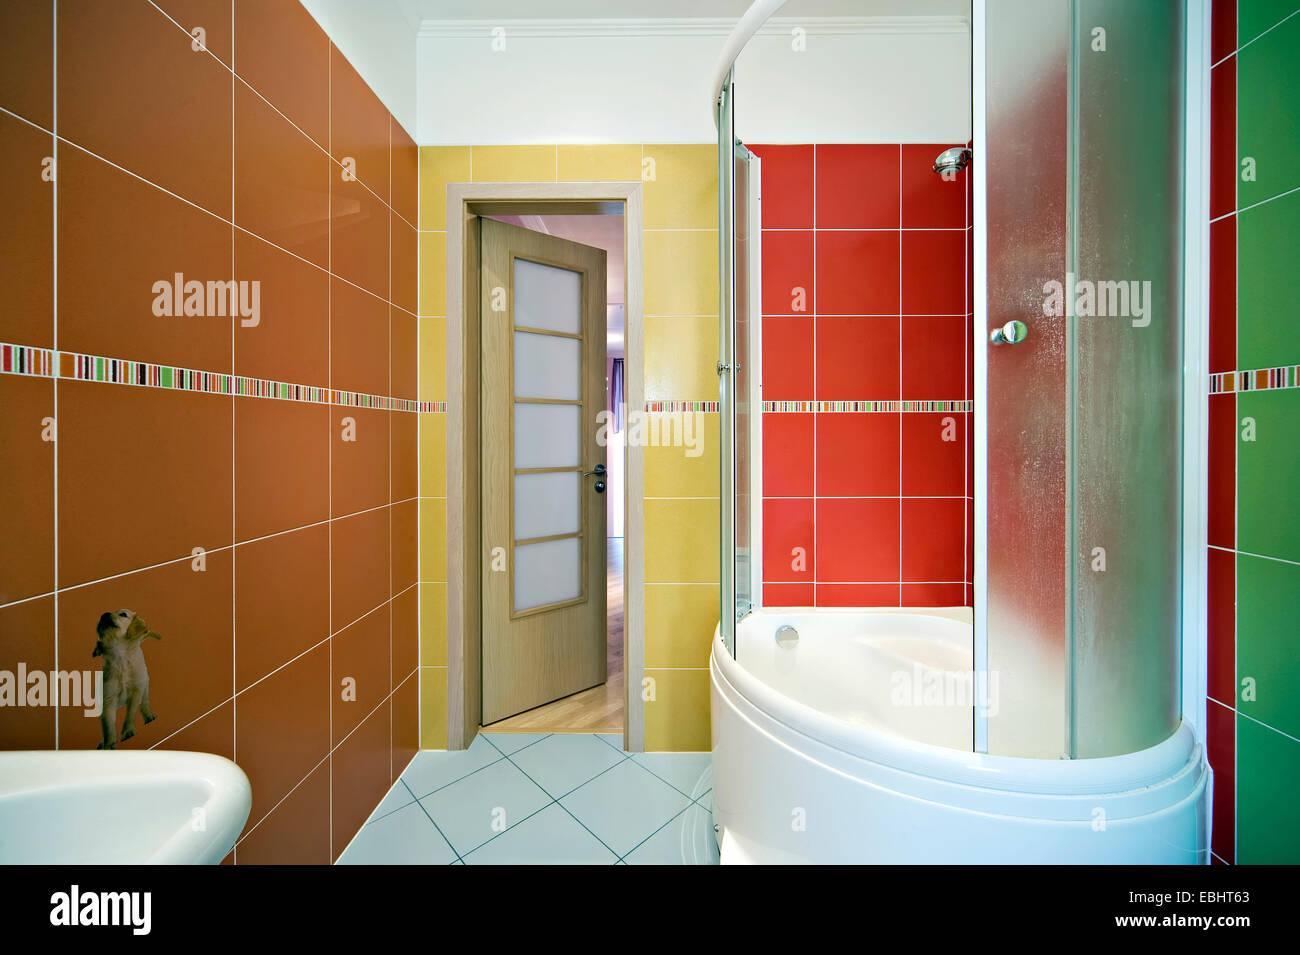 Modern Bathroom Interior Shower Cabin Mirror Sink Vertical Indoors Home Bathtub Contemporary Luxury Floor